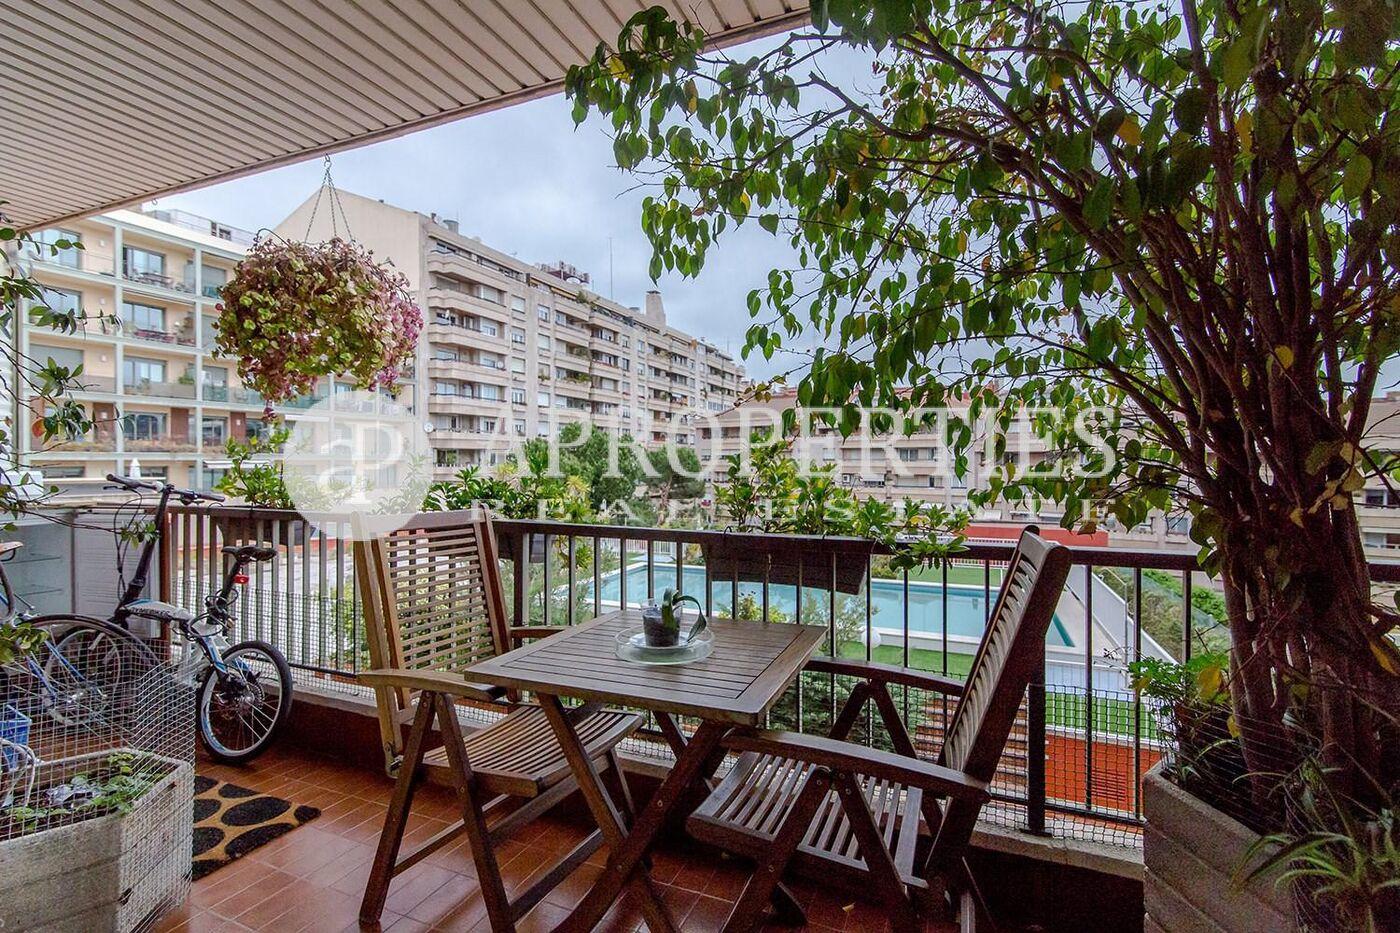 Estupendo piso en plaza bonanova con piscina en alquiler - Pisos con piscina en barcelona alquiler ...